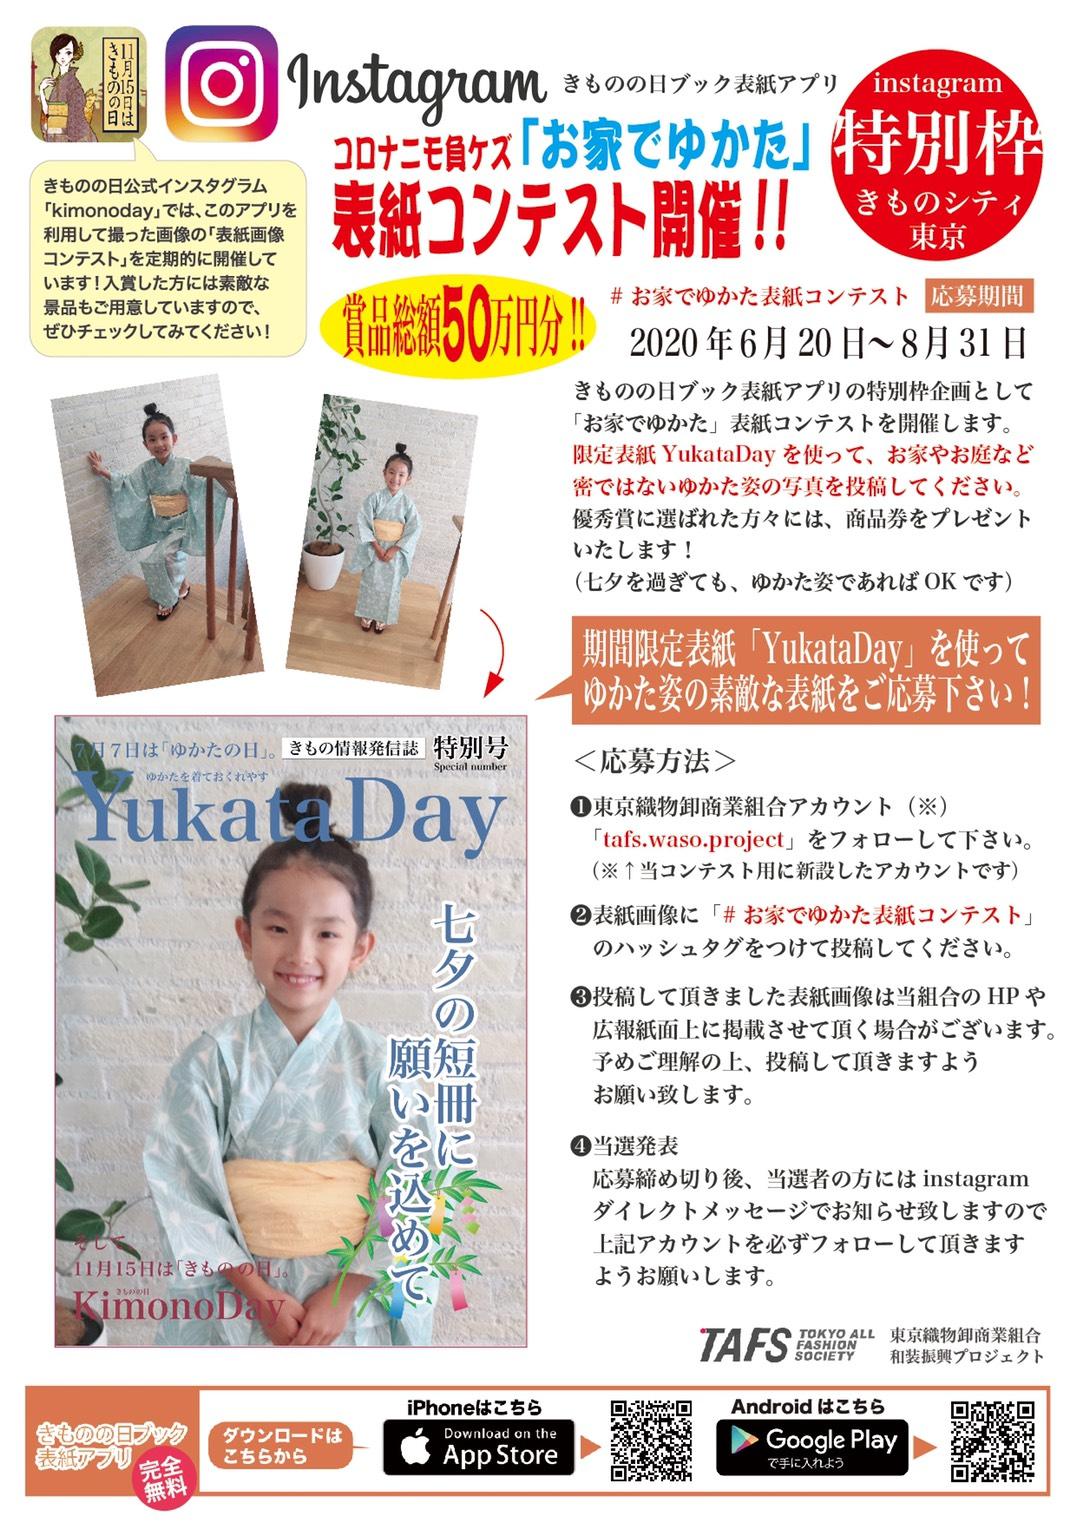 yukataday_1.JPG